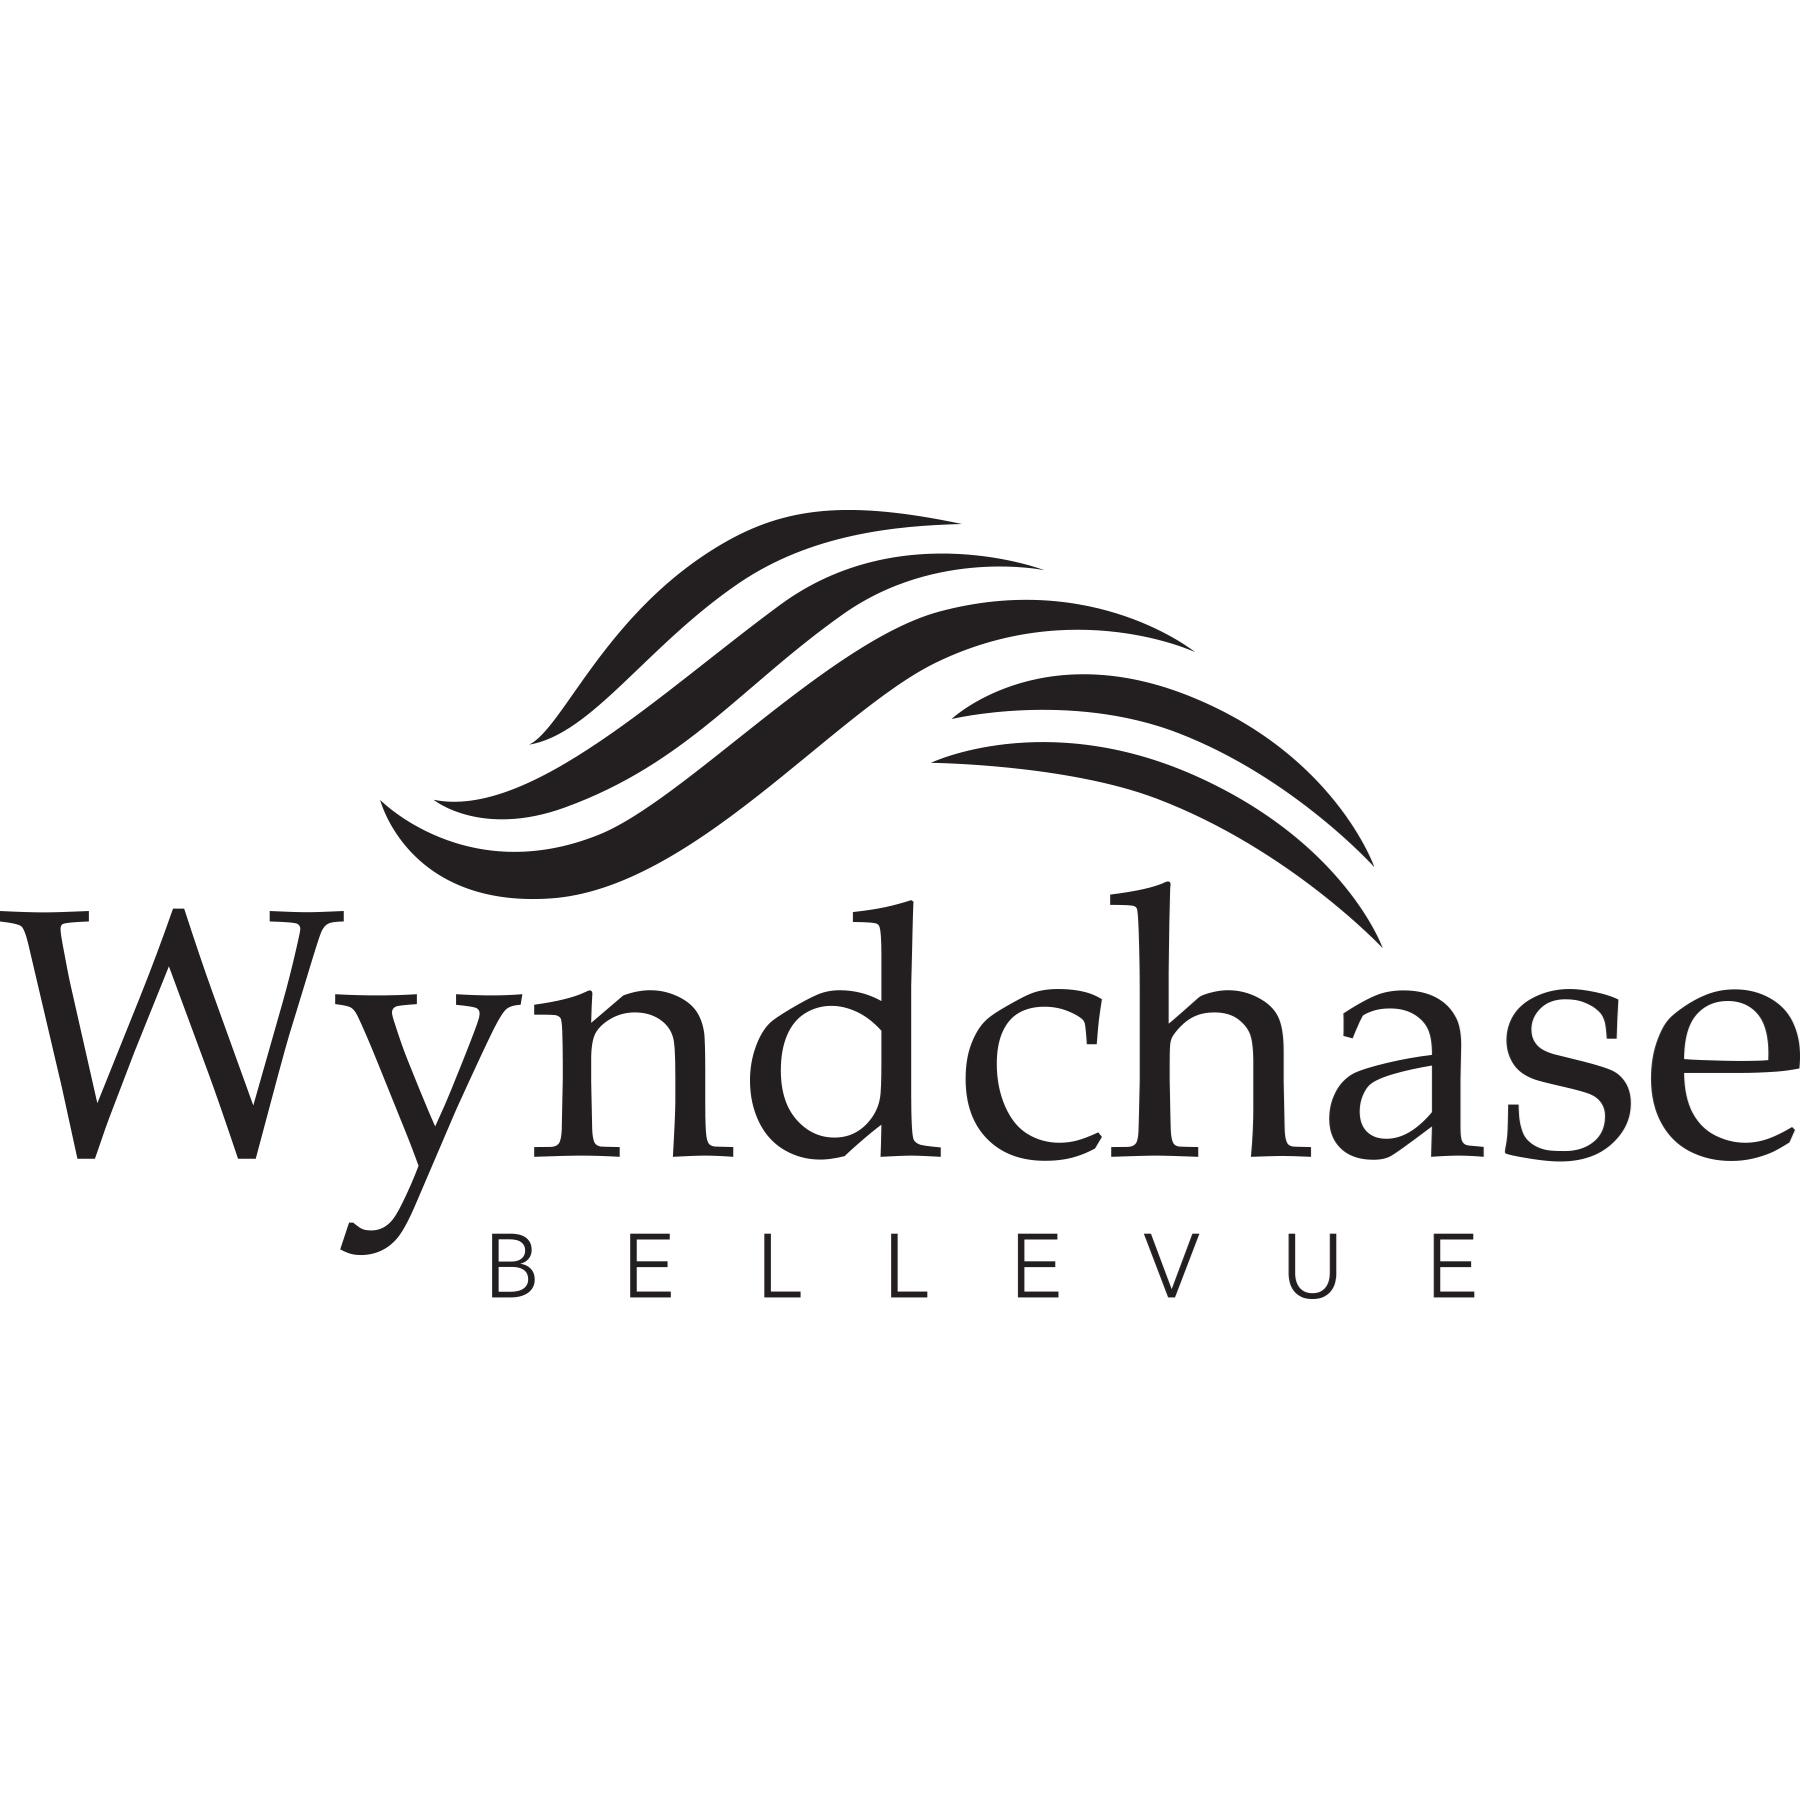 Wyndchase Bellevue Apartments - Nashville, TN - Apartments